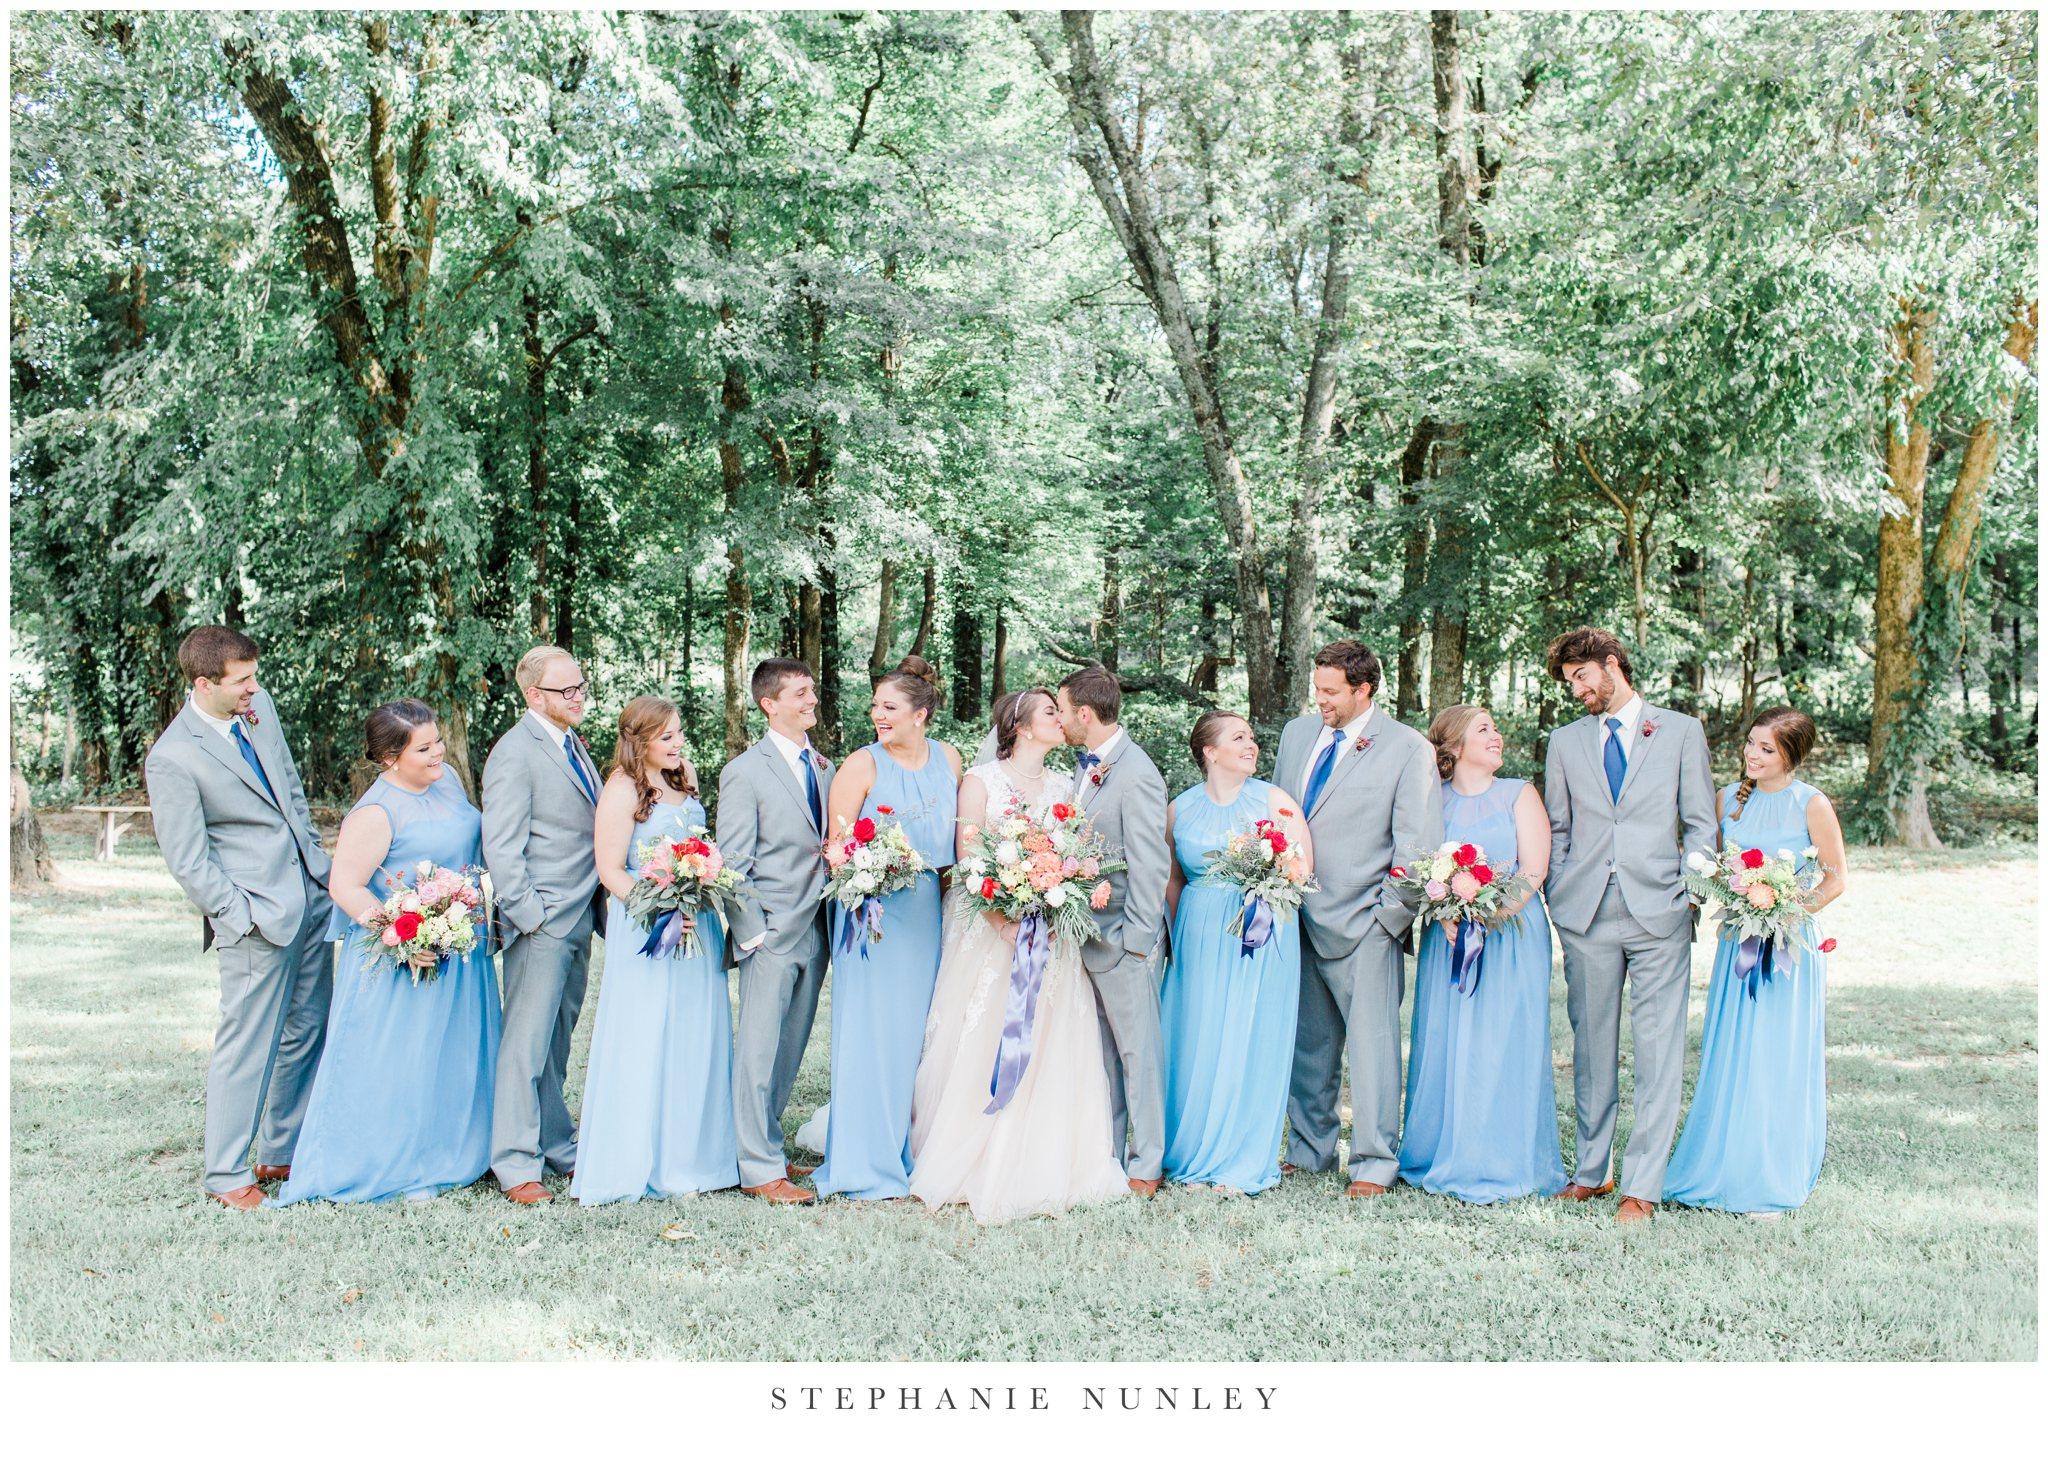 arkansas-wedding-with-lush-wildflower-bouquet-0073.jpg